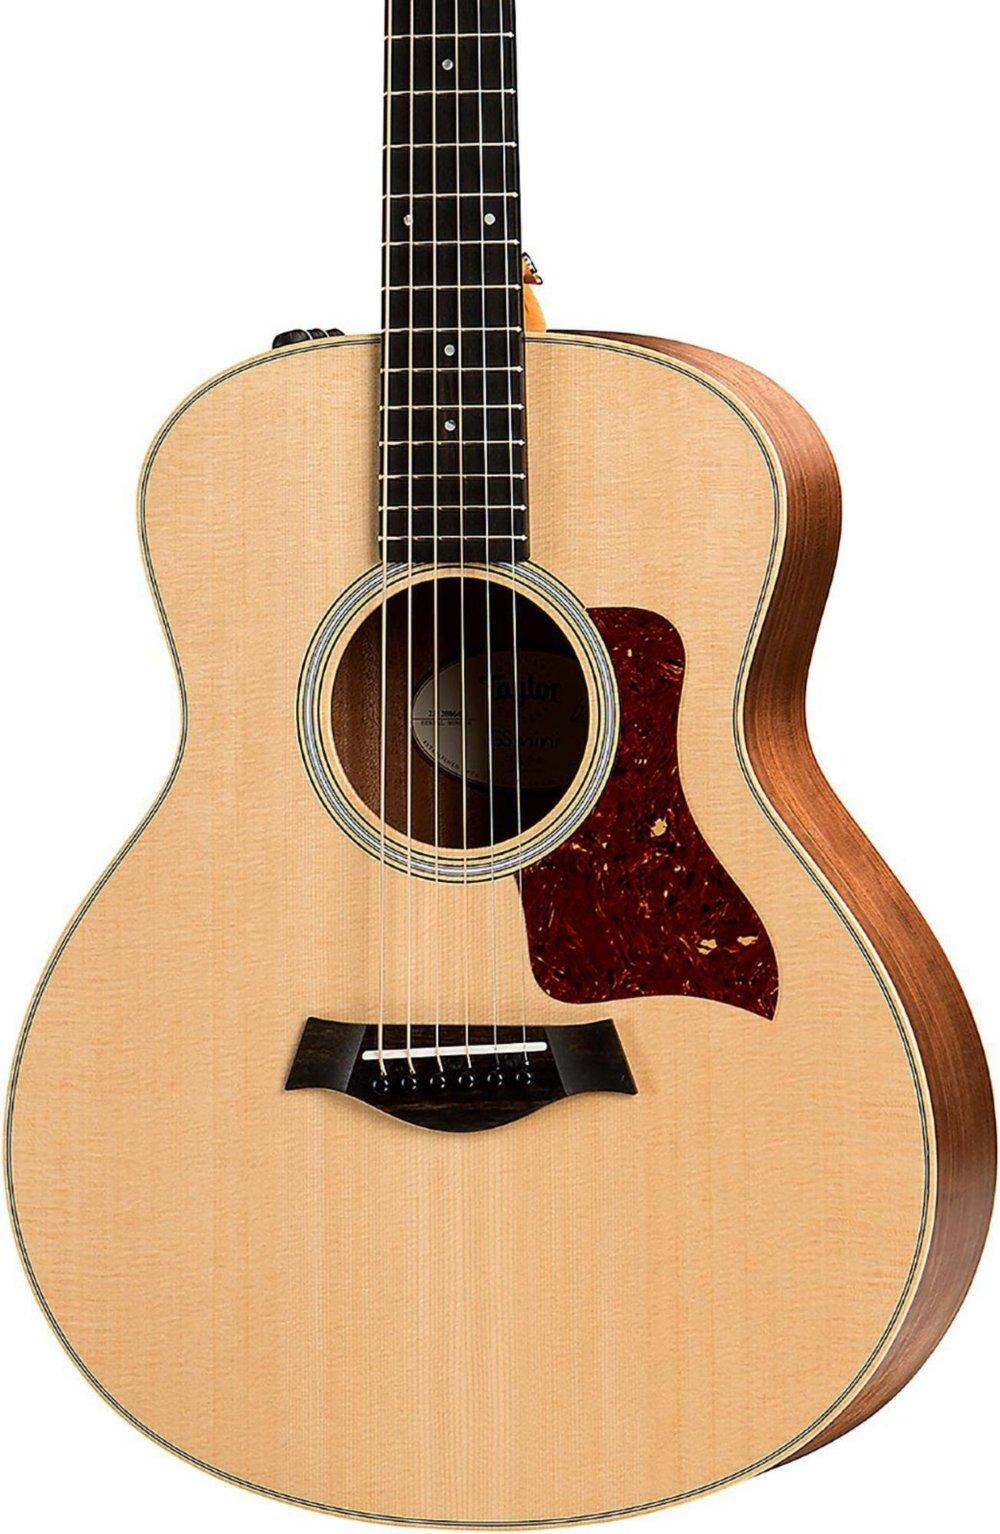 Taylor GS Mini-e Walnut Acoustic/Electric Guitar Natural